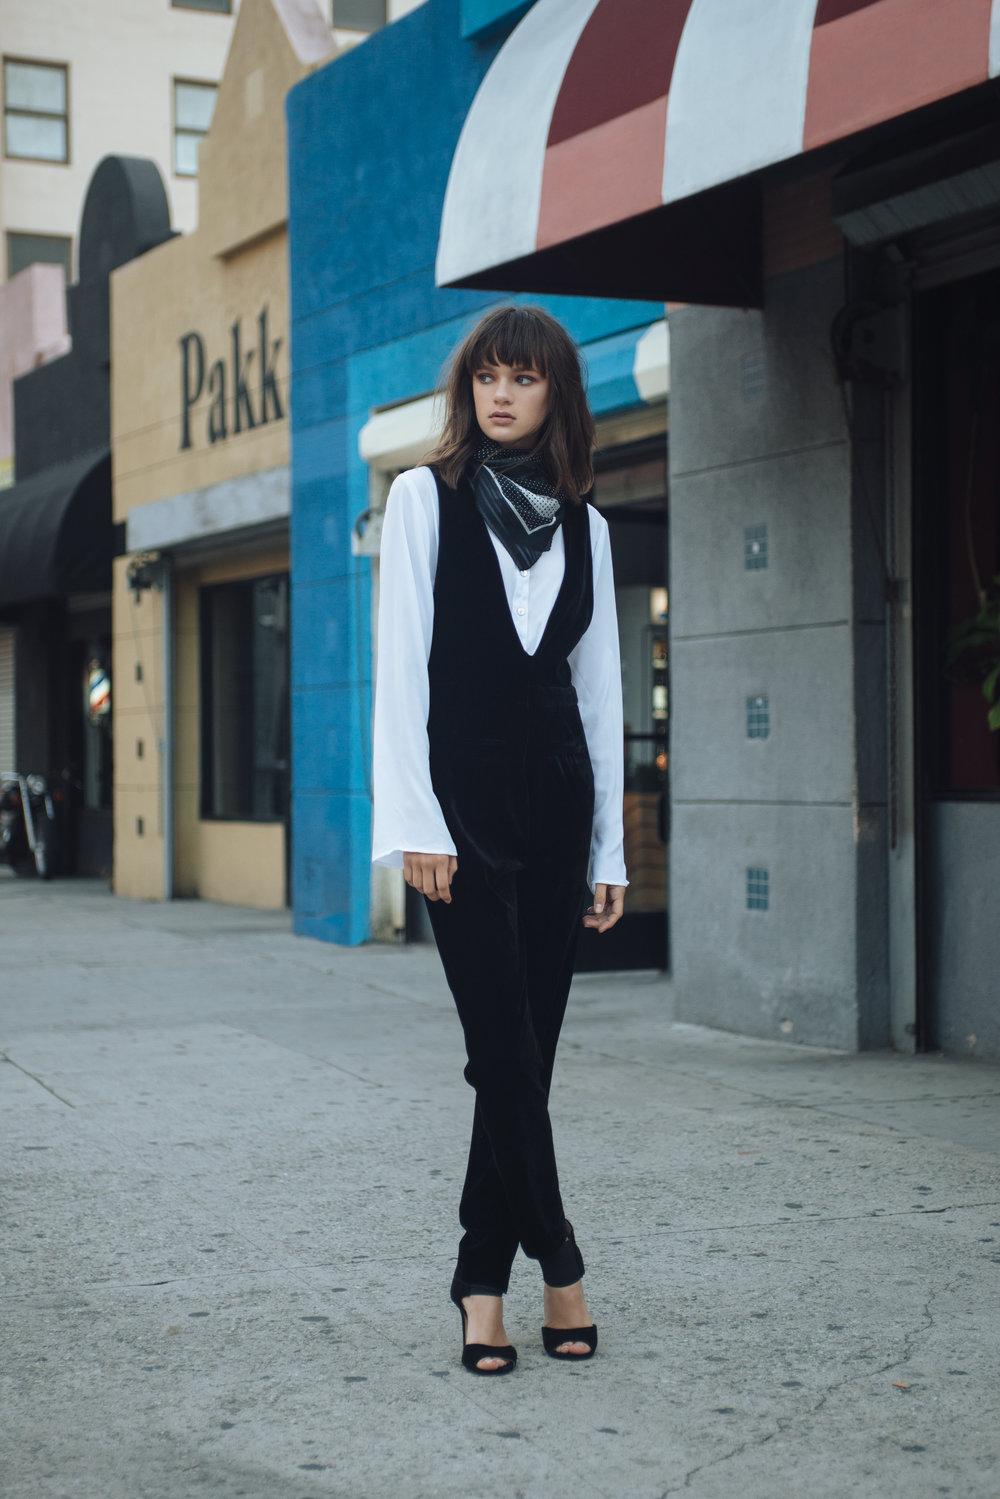 Greta Brooks by Jacqueline Puwalski